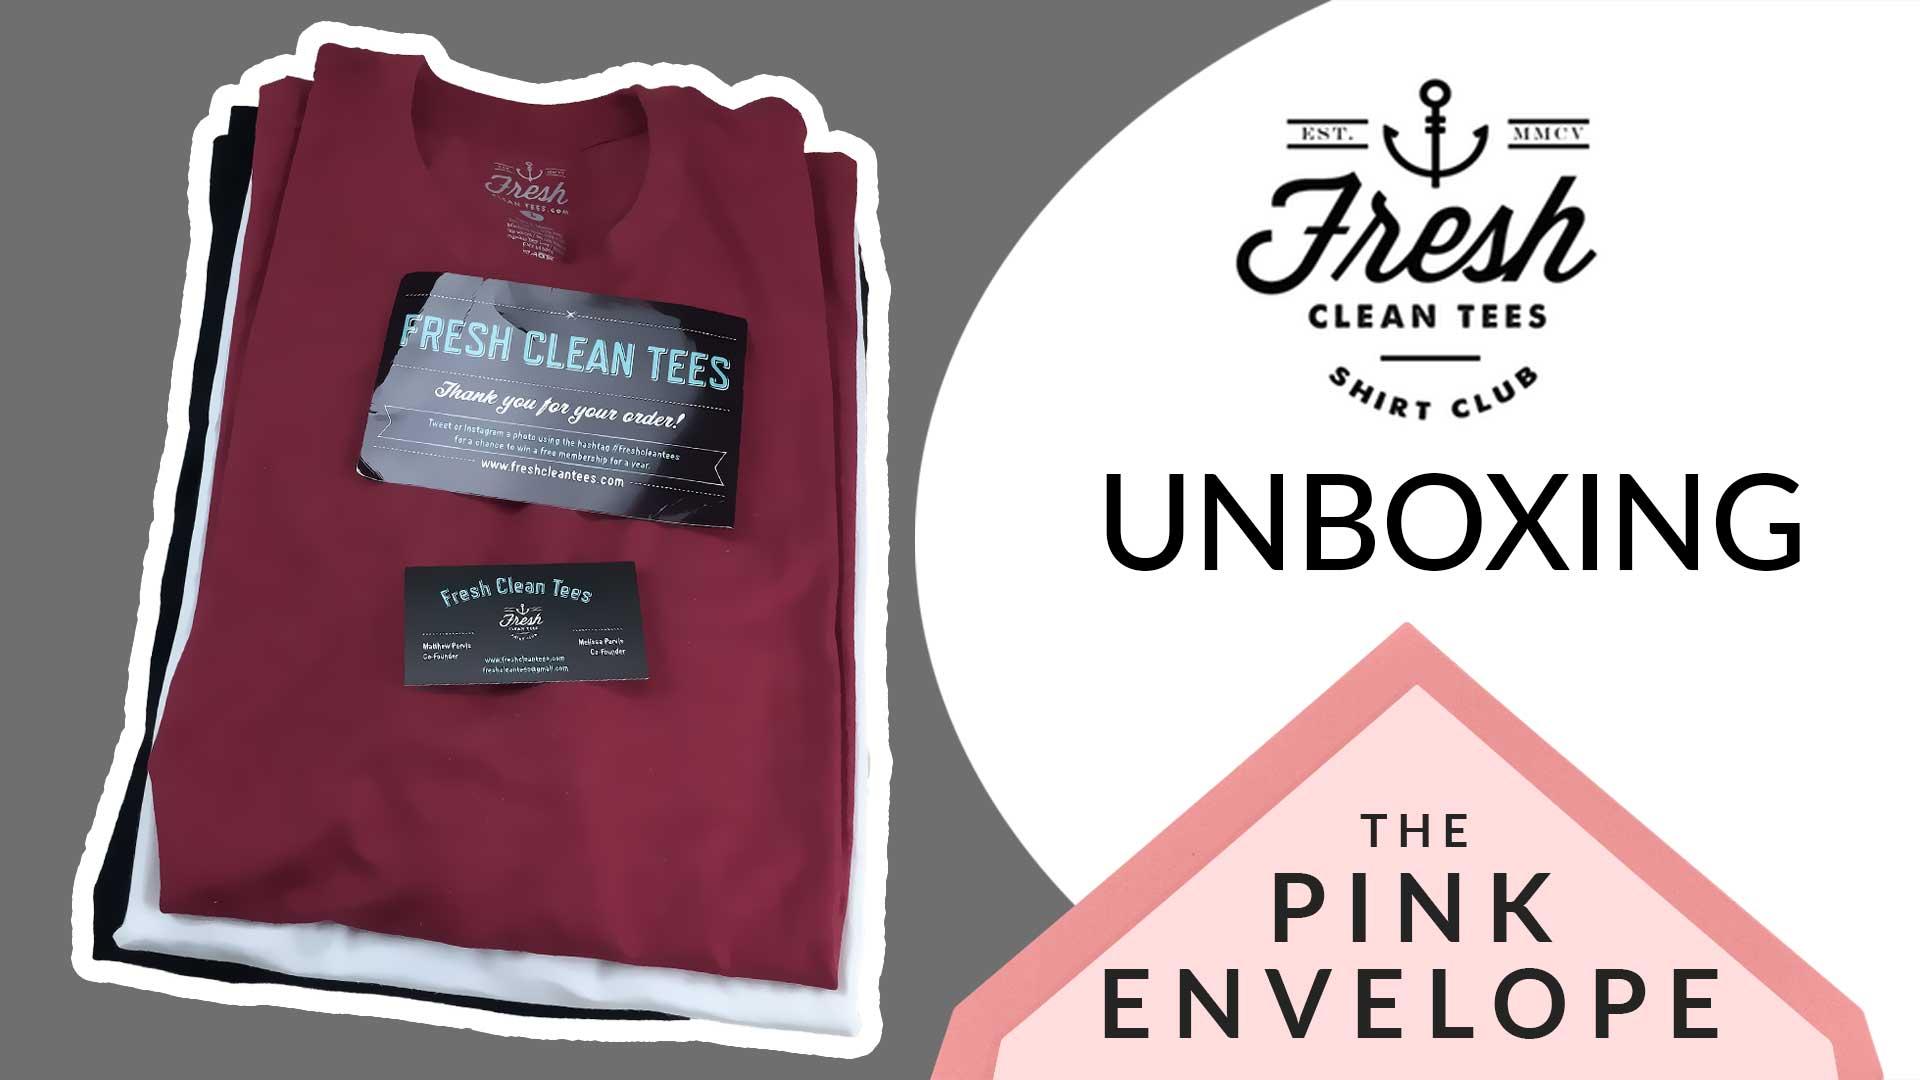 Mens Tshirt Subscription Box – Fresh Clean Tees Review